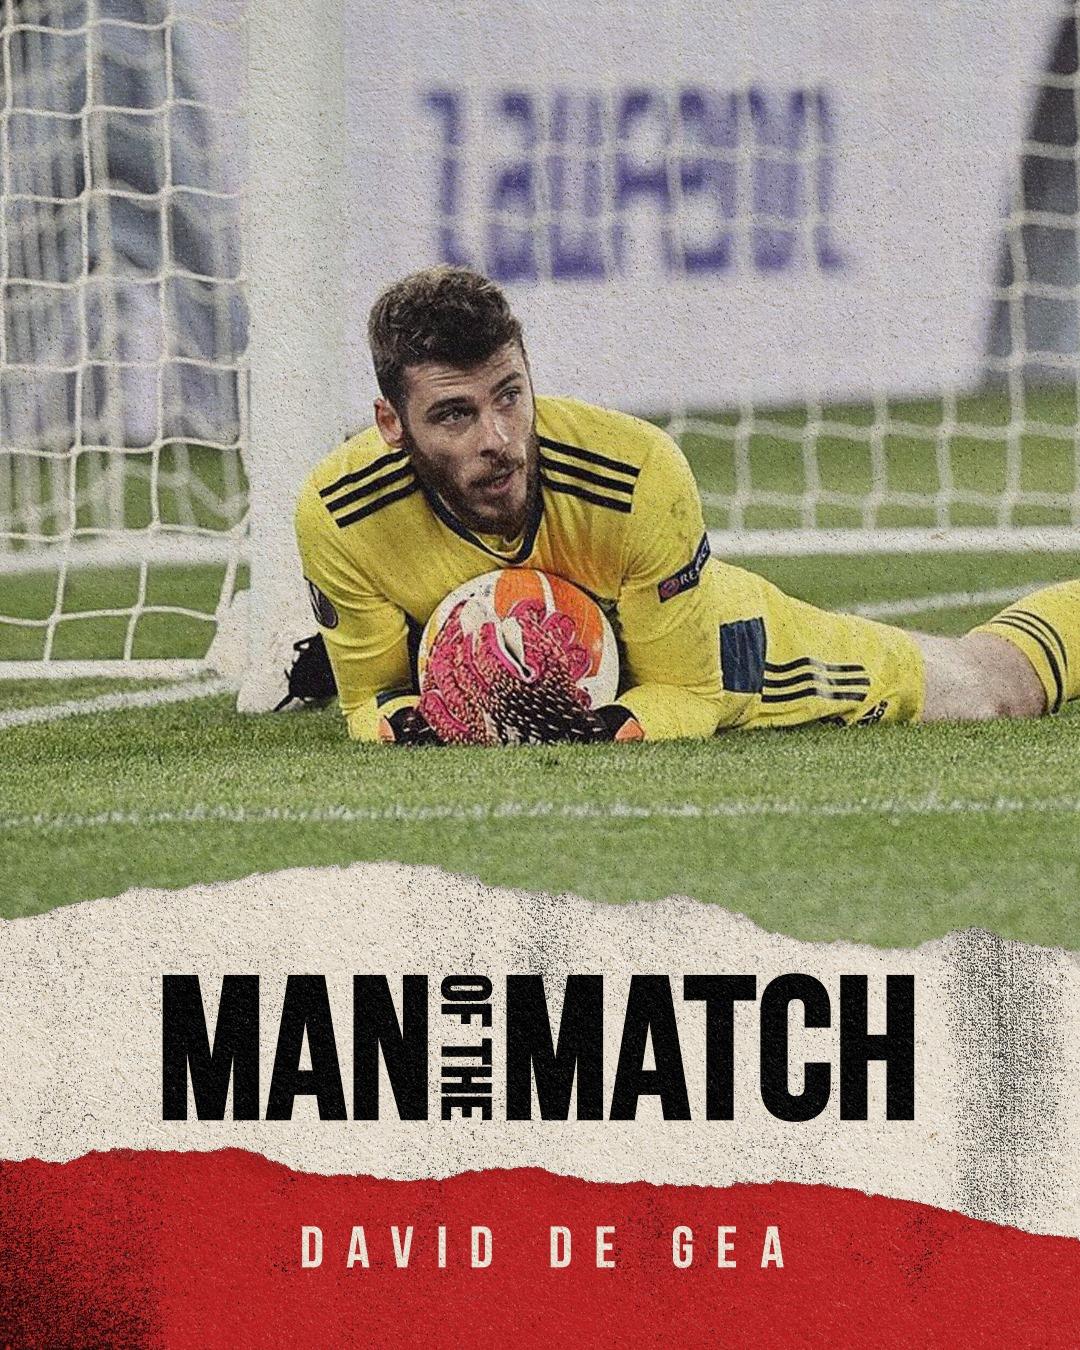 Рома (Италия) - Манчестер Юнайтед (Англия) 3:2